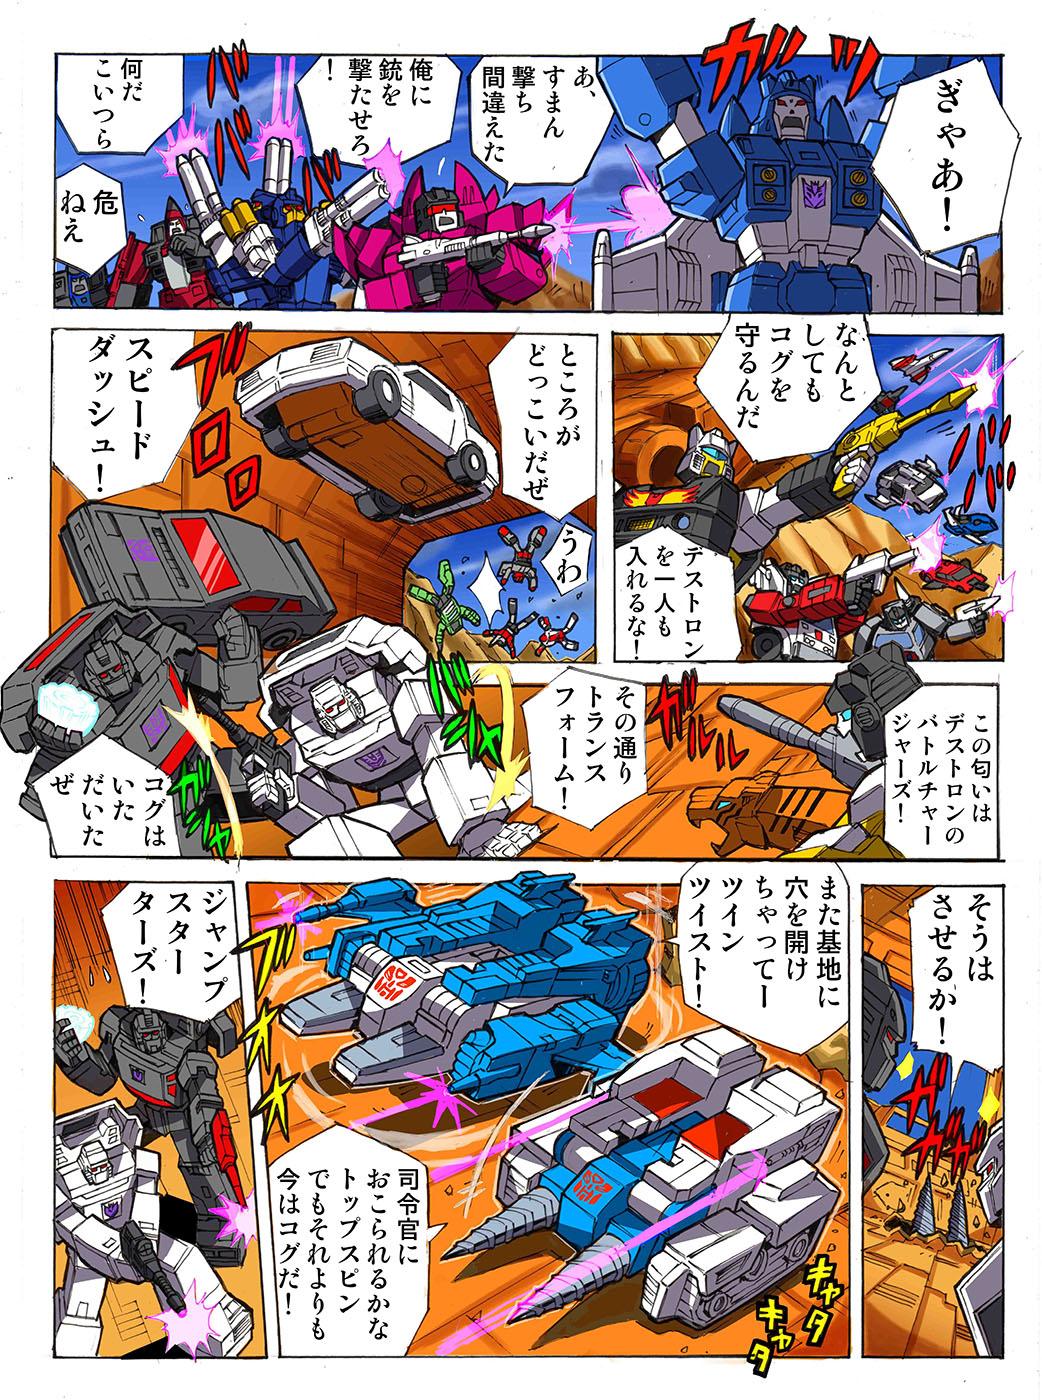 comic transformers legends web manga takara tomy chapter comics tfw2005 legedns website ep boards